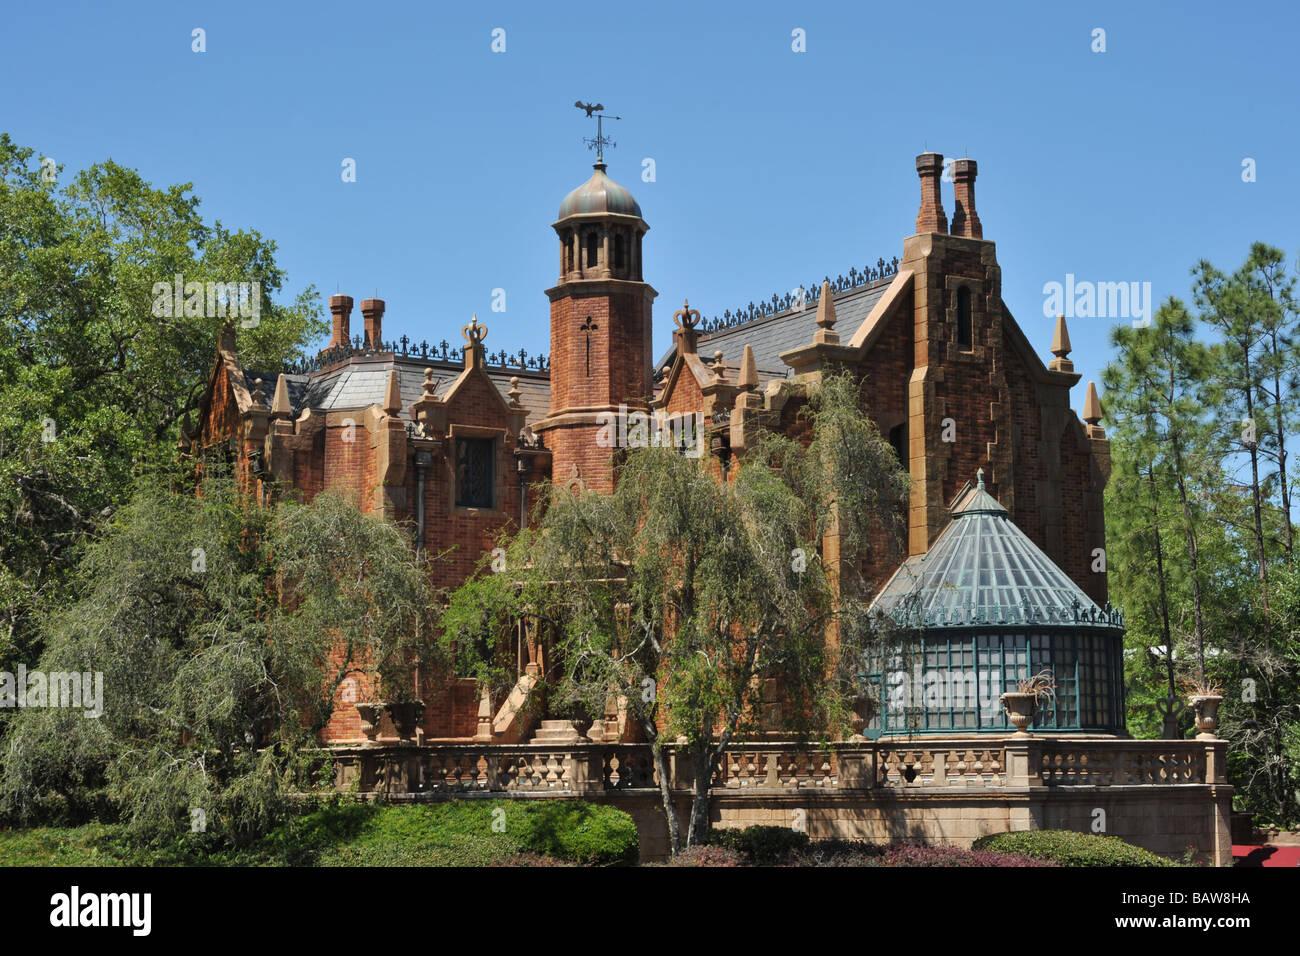 maison hantee magic kingdom